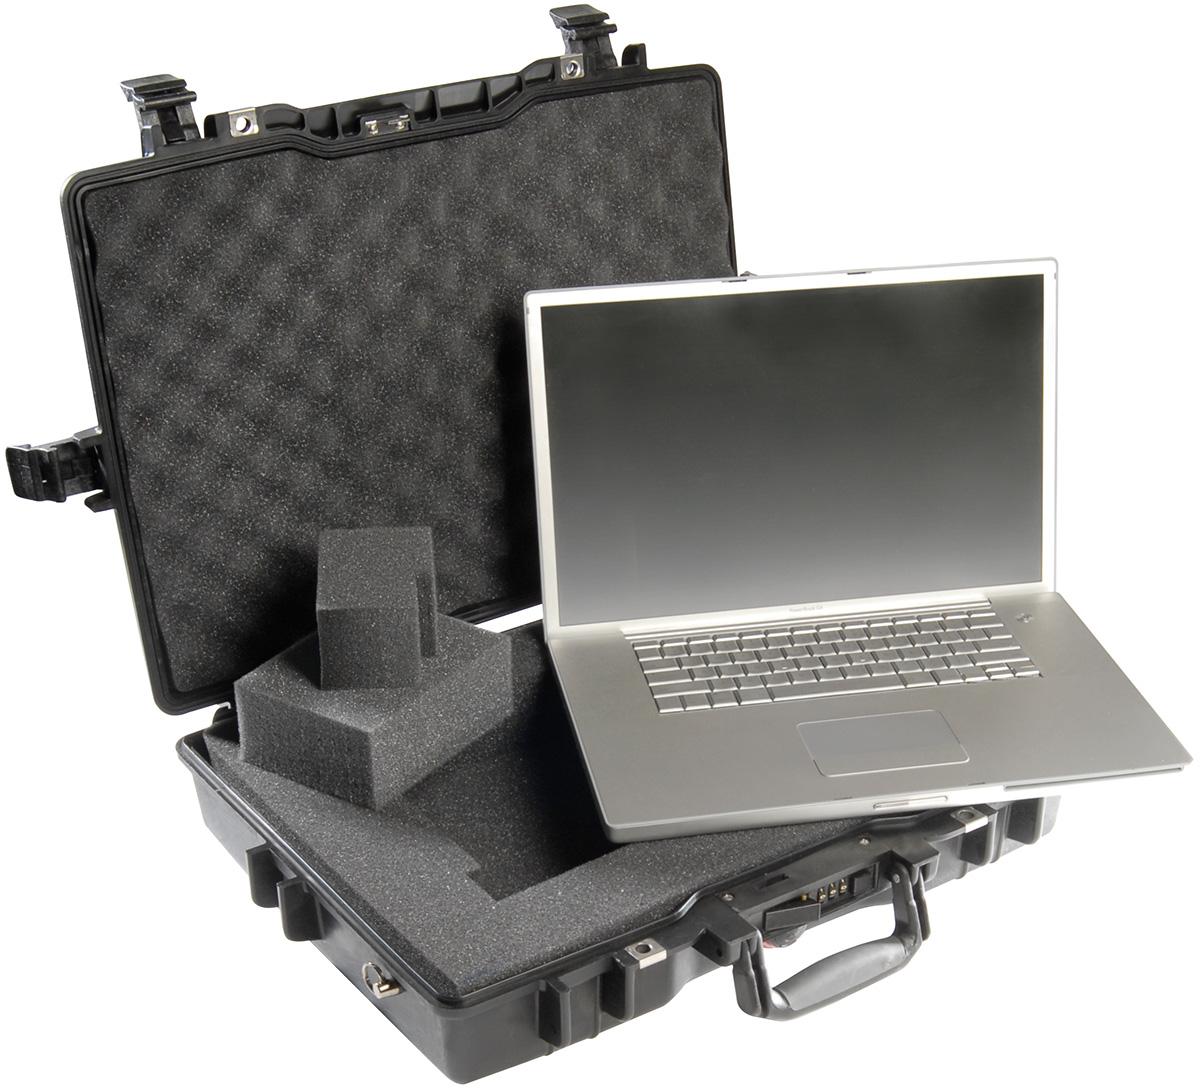 pelican usa made macbook laptop hard case